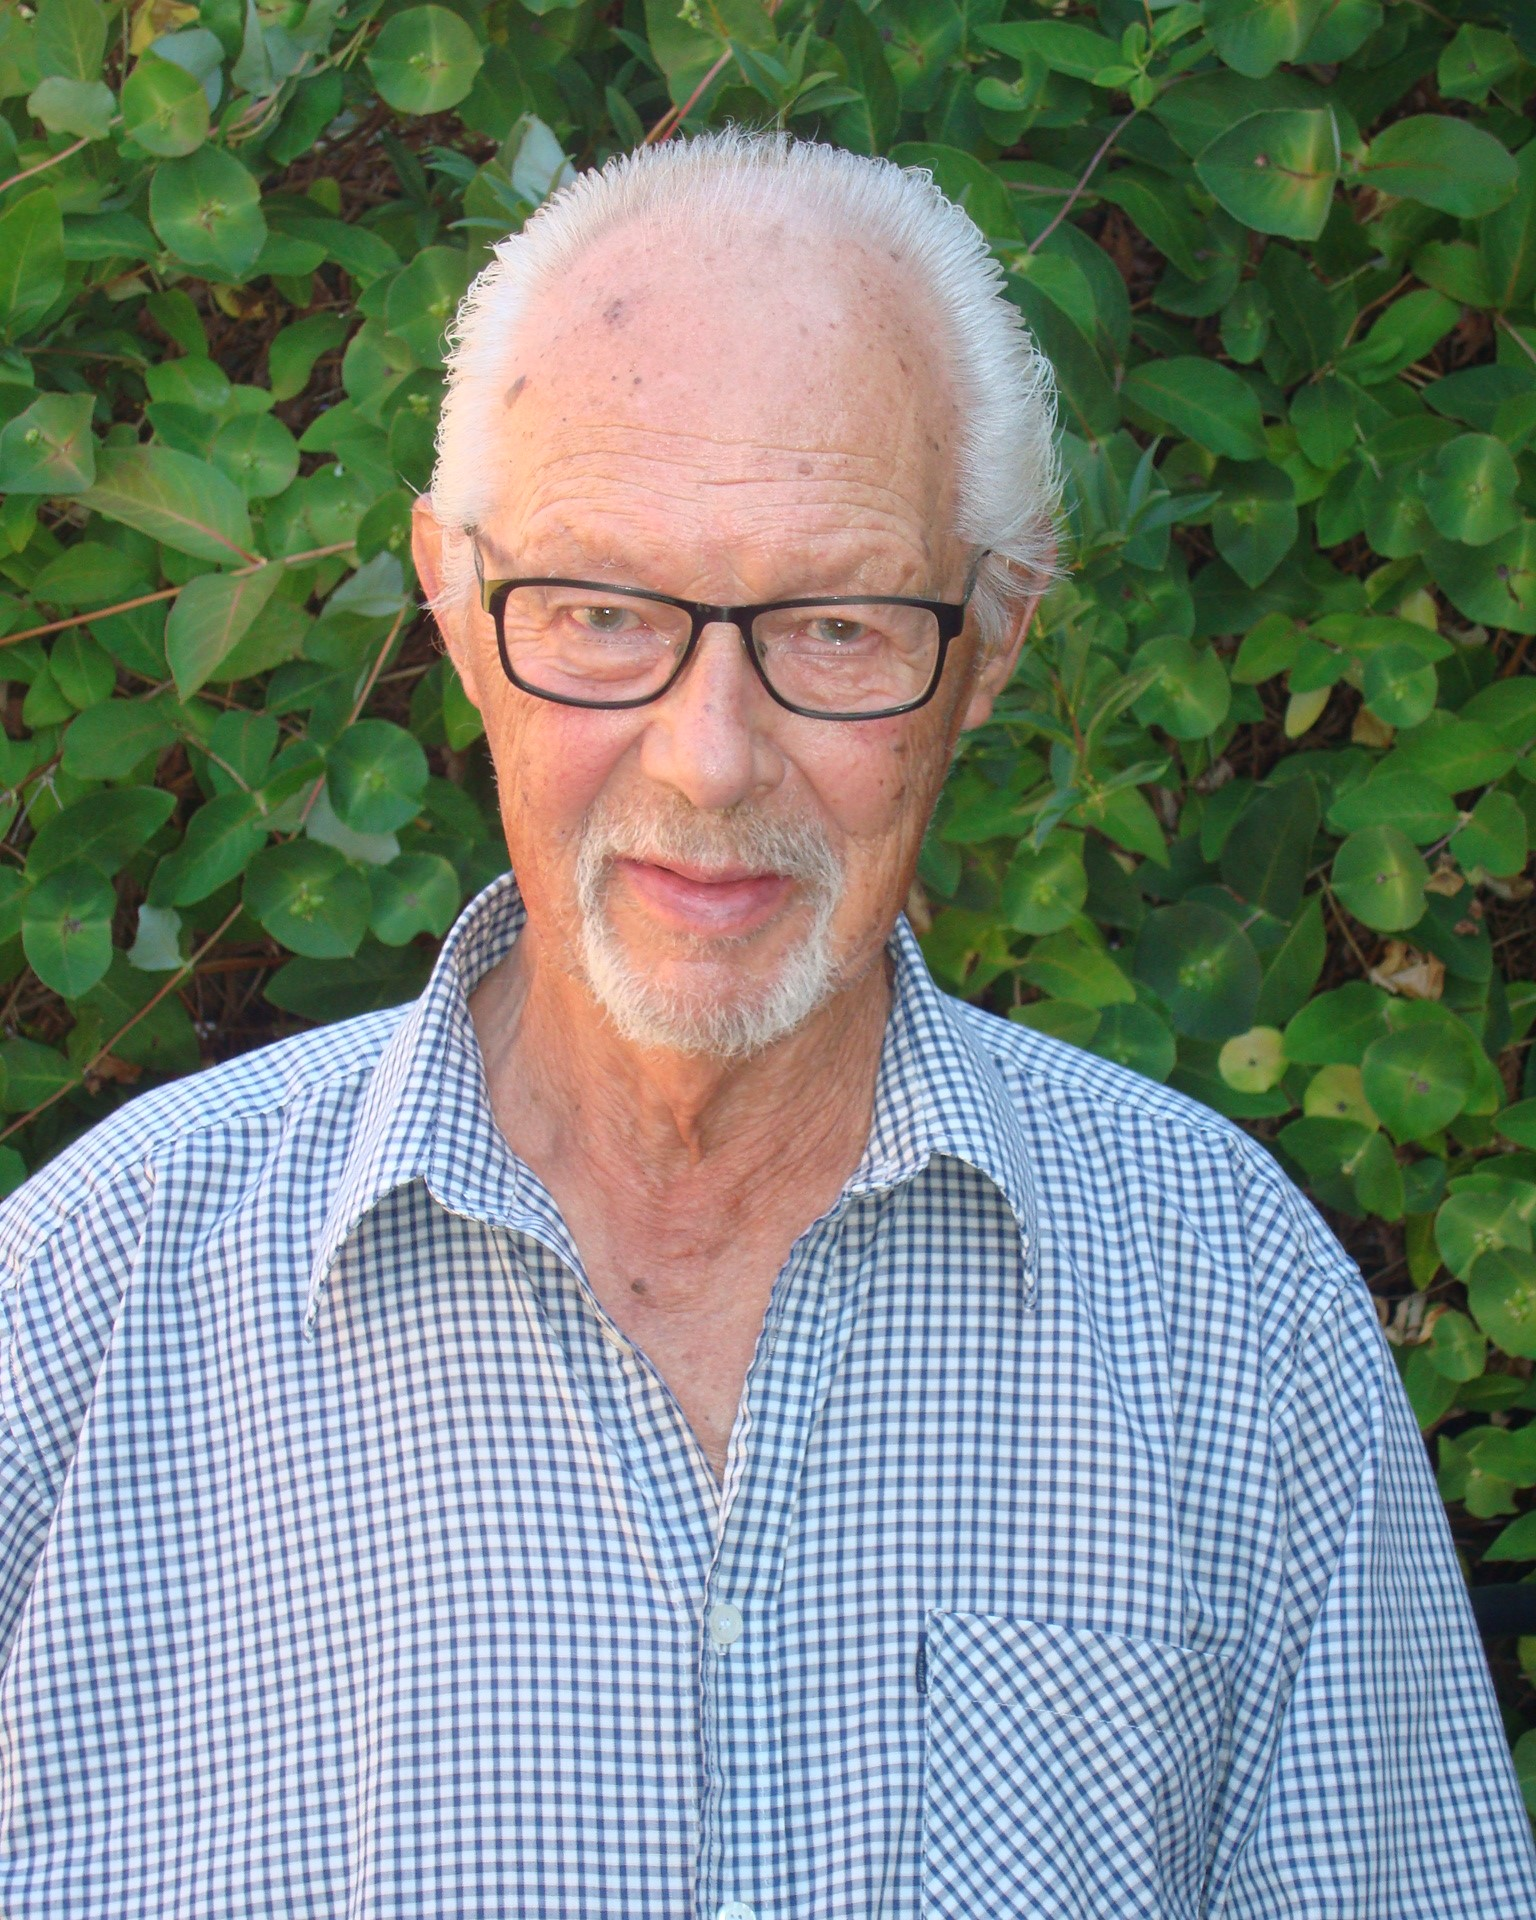 Tidligere DCF-kasserer Per Burmester fylder 90 år den 25.juli